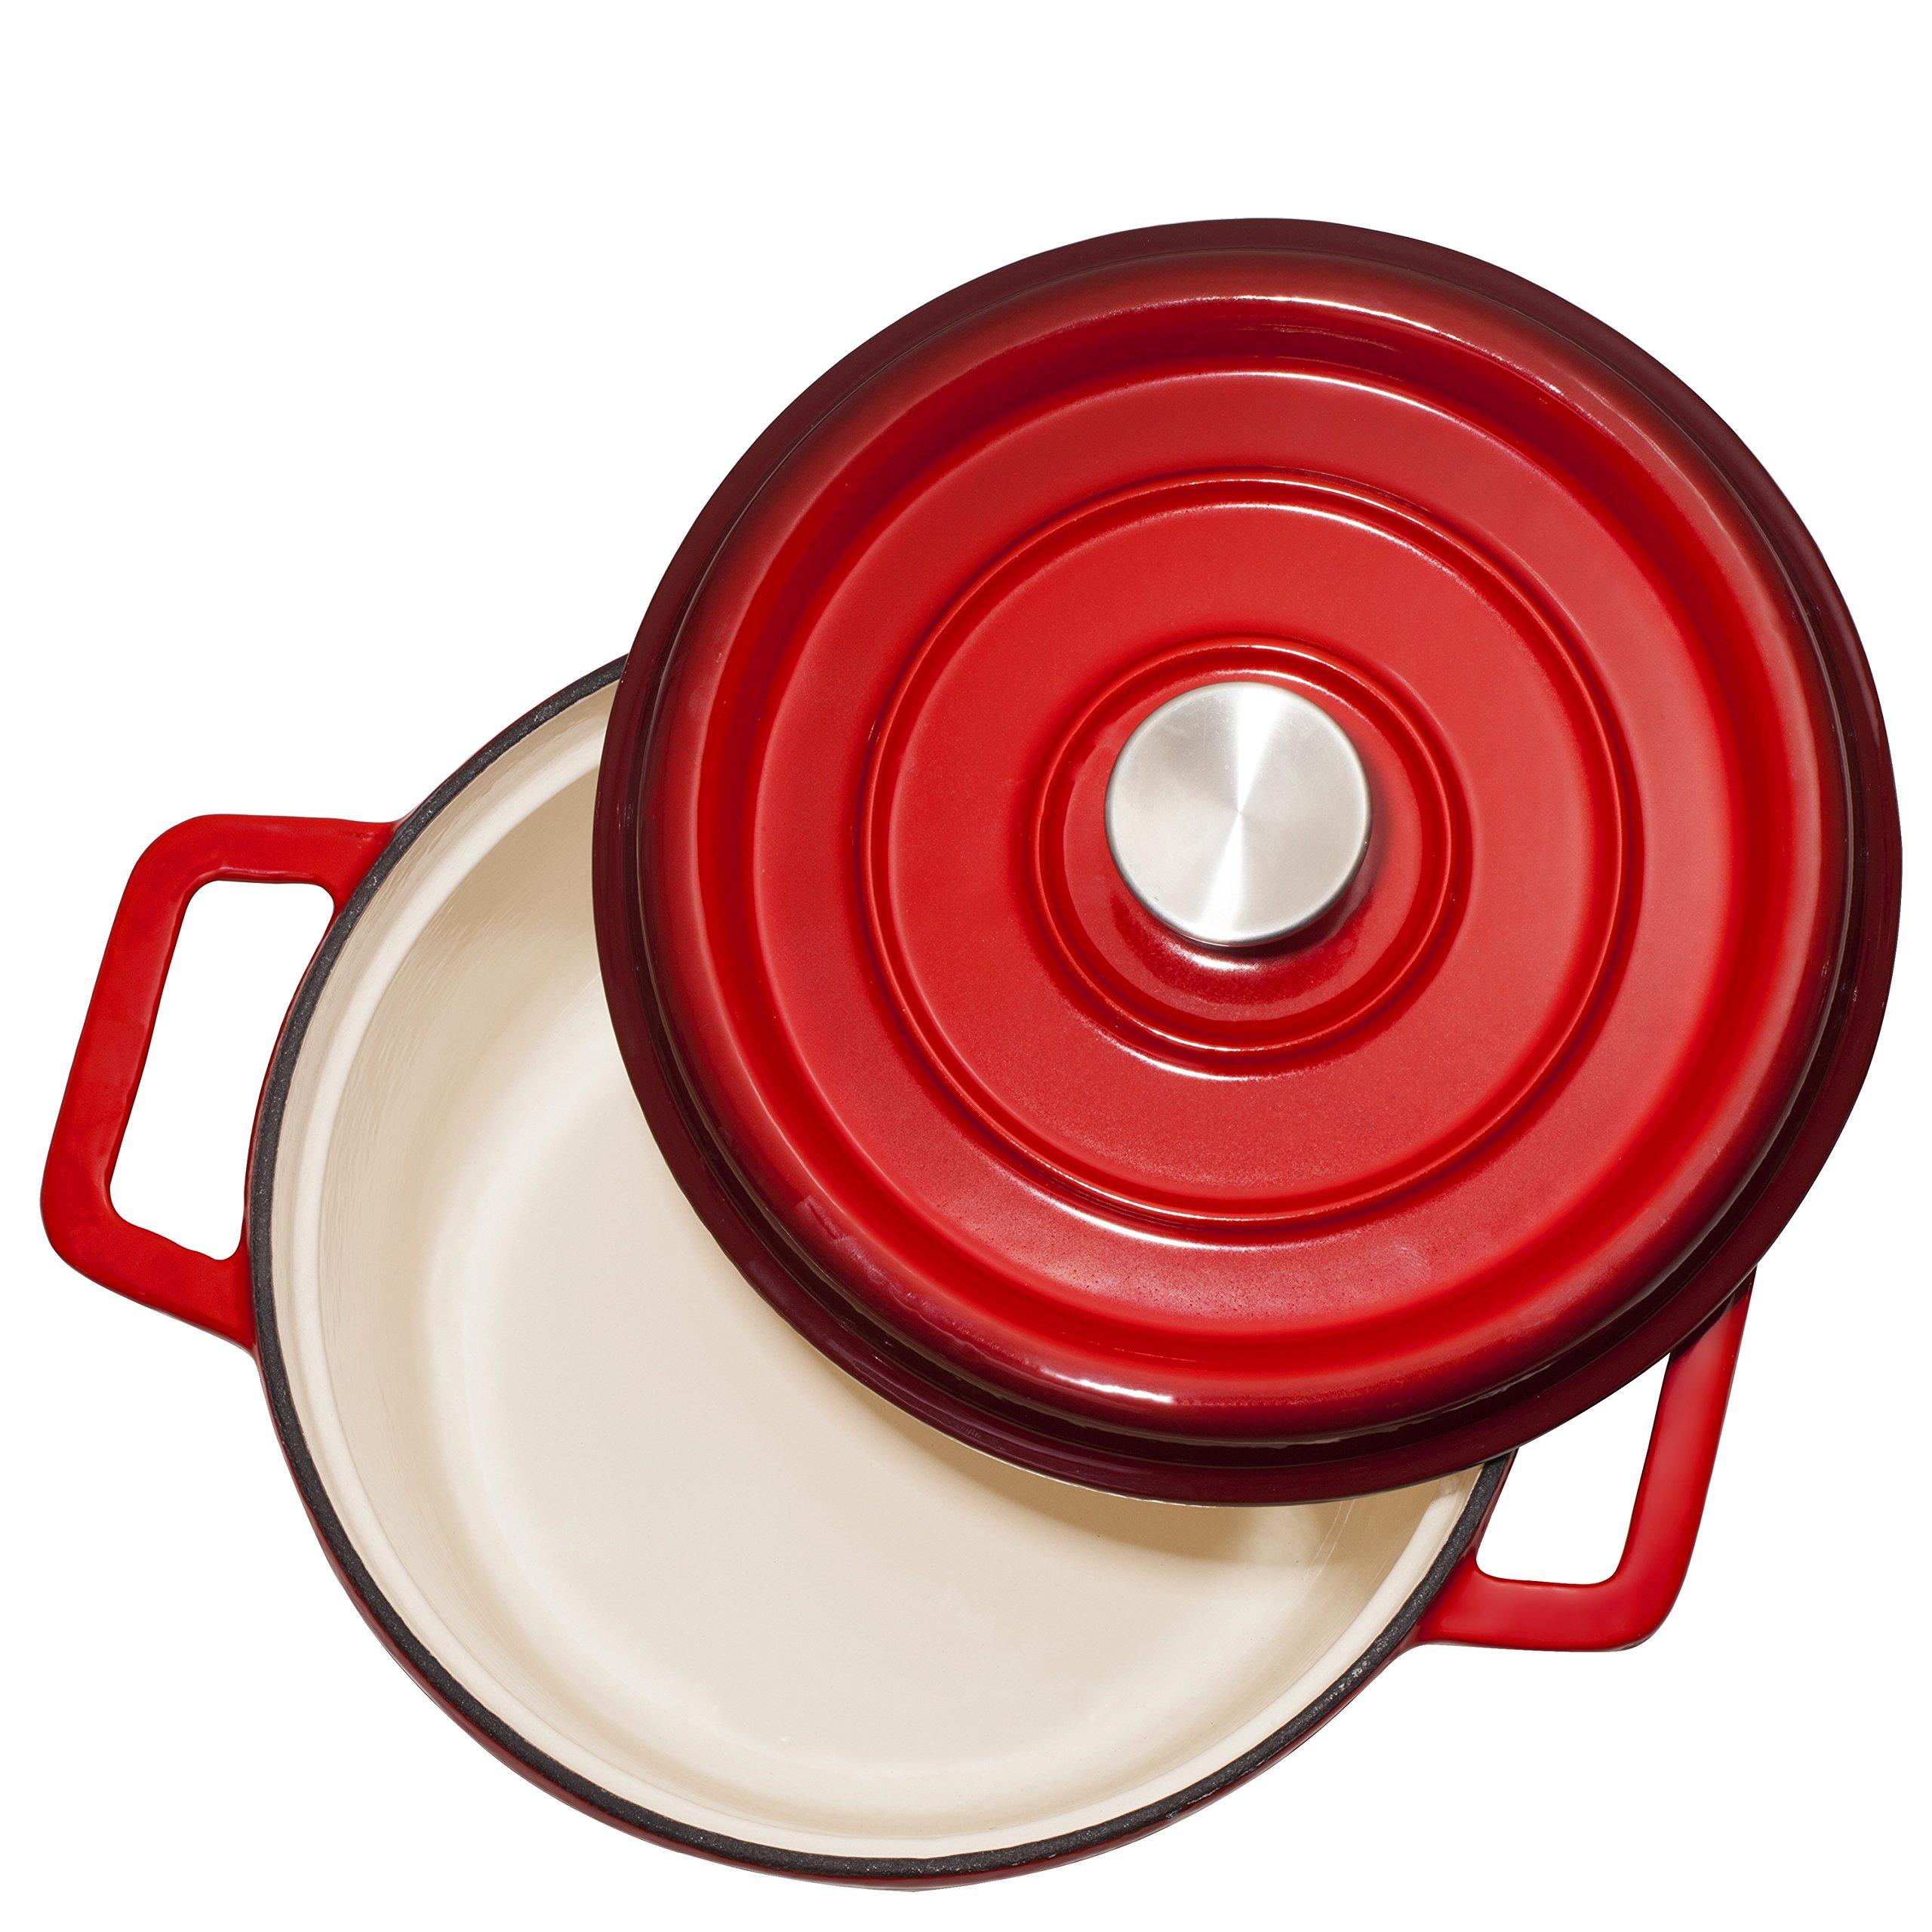 Bruntmor, Enameled Cast Iron Dutch Oven Casserole Dish 6.5 quart Large Loop Handles & Self-Basting Condensation Ridges On Lid (Fire Red) by Bruntmor (Image #2)